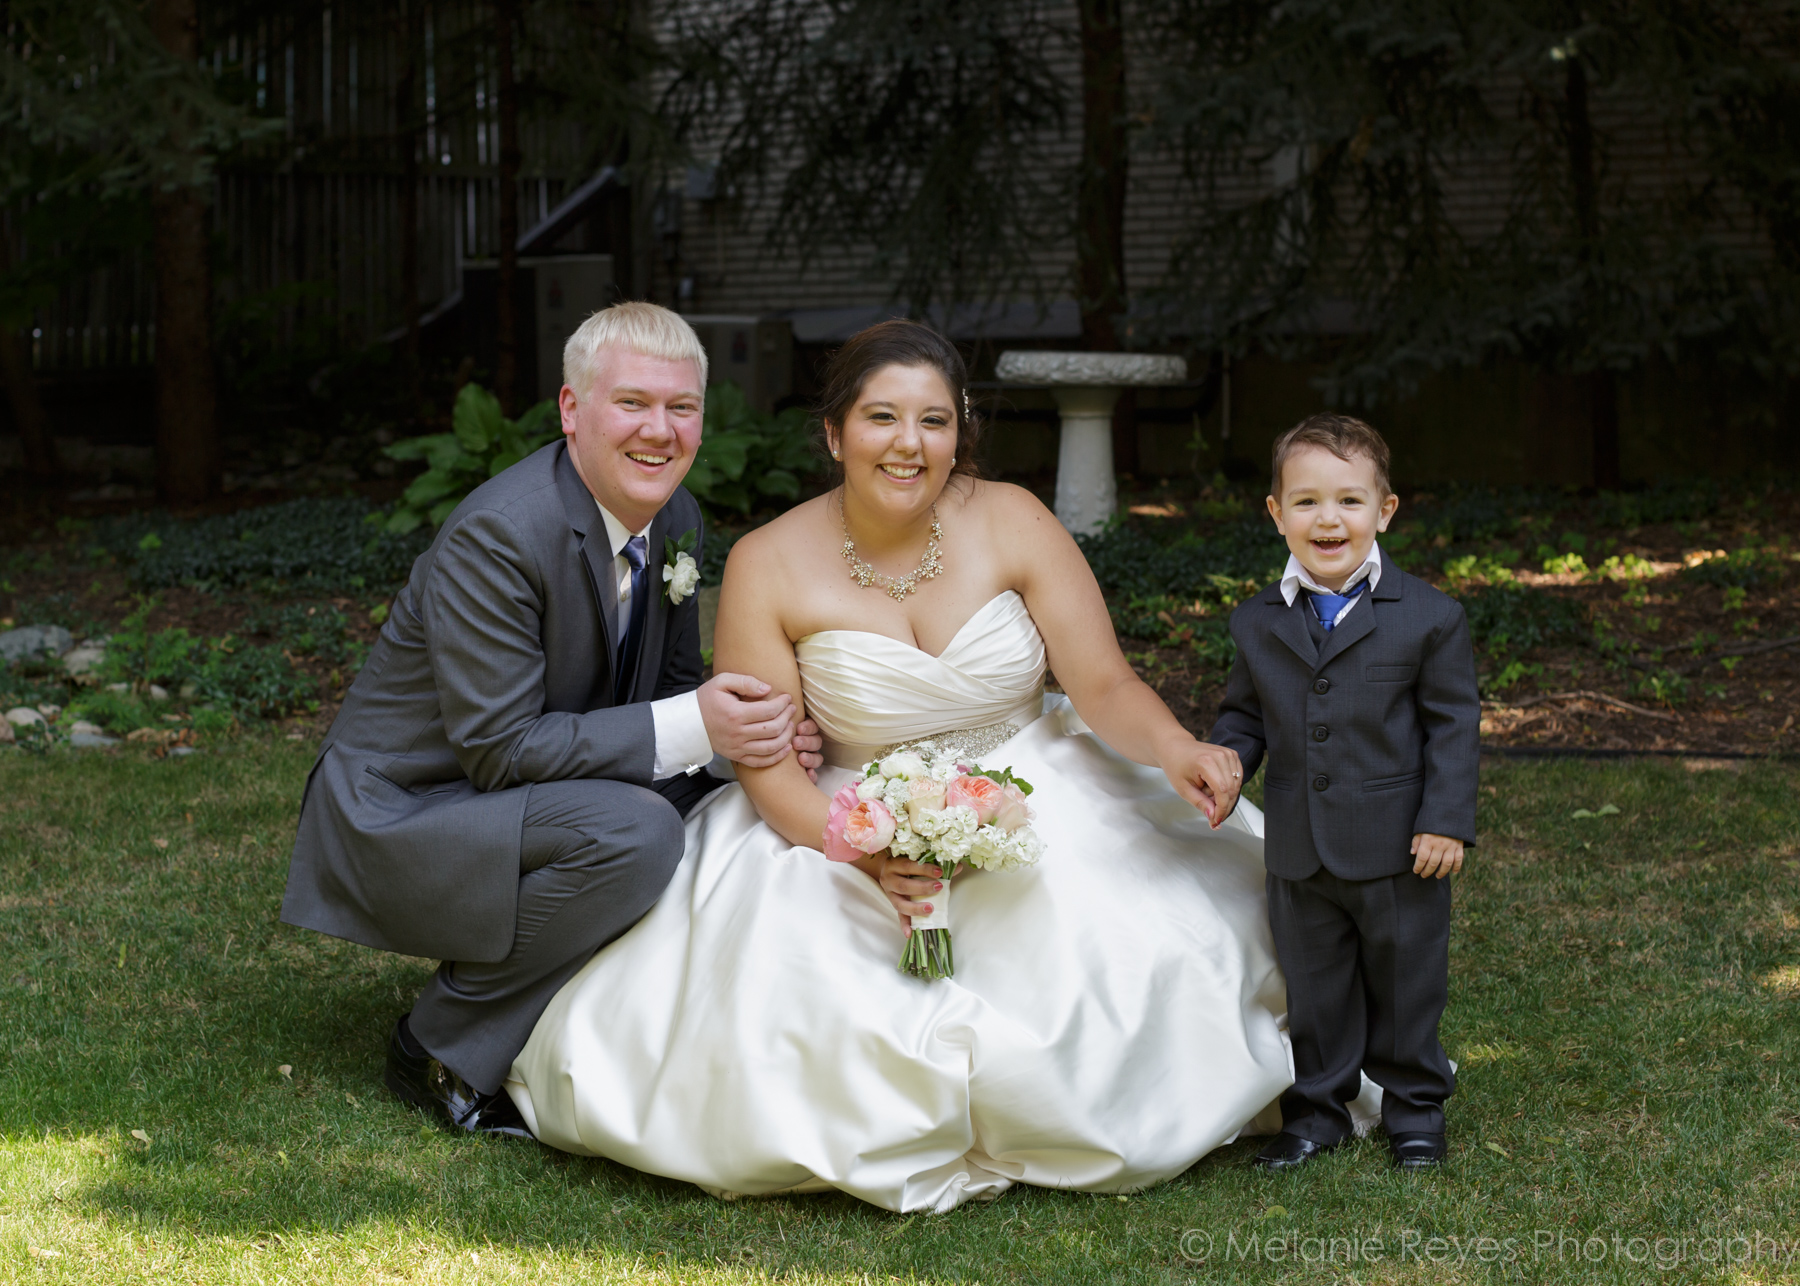 MC_annarbor_uofm_wedding_037